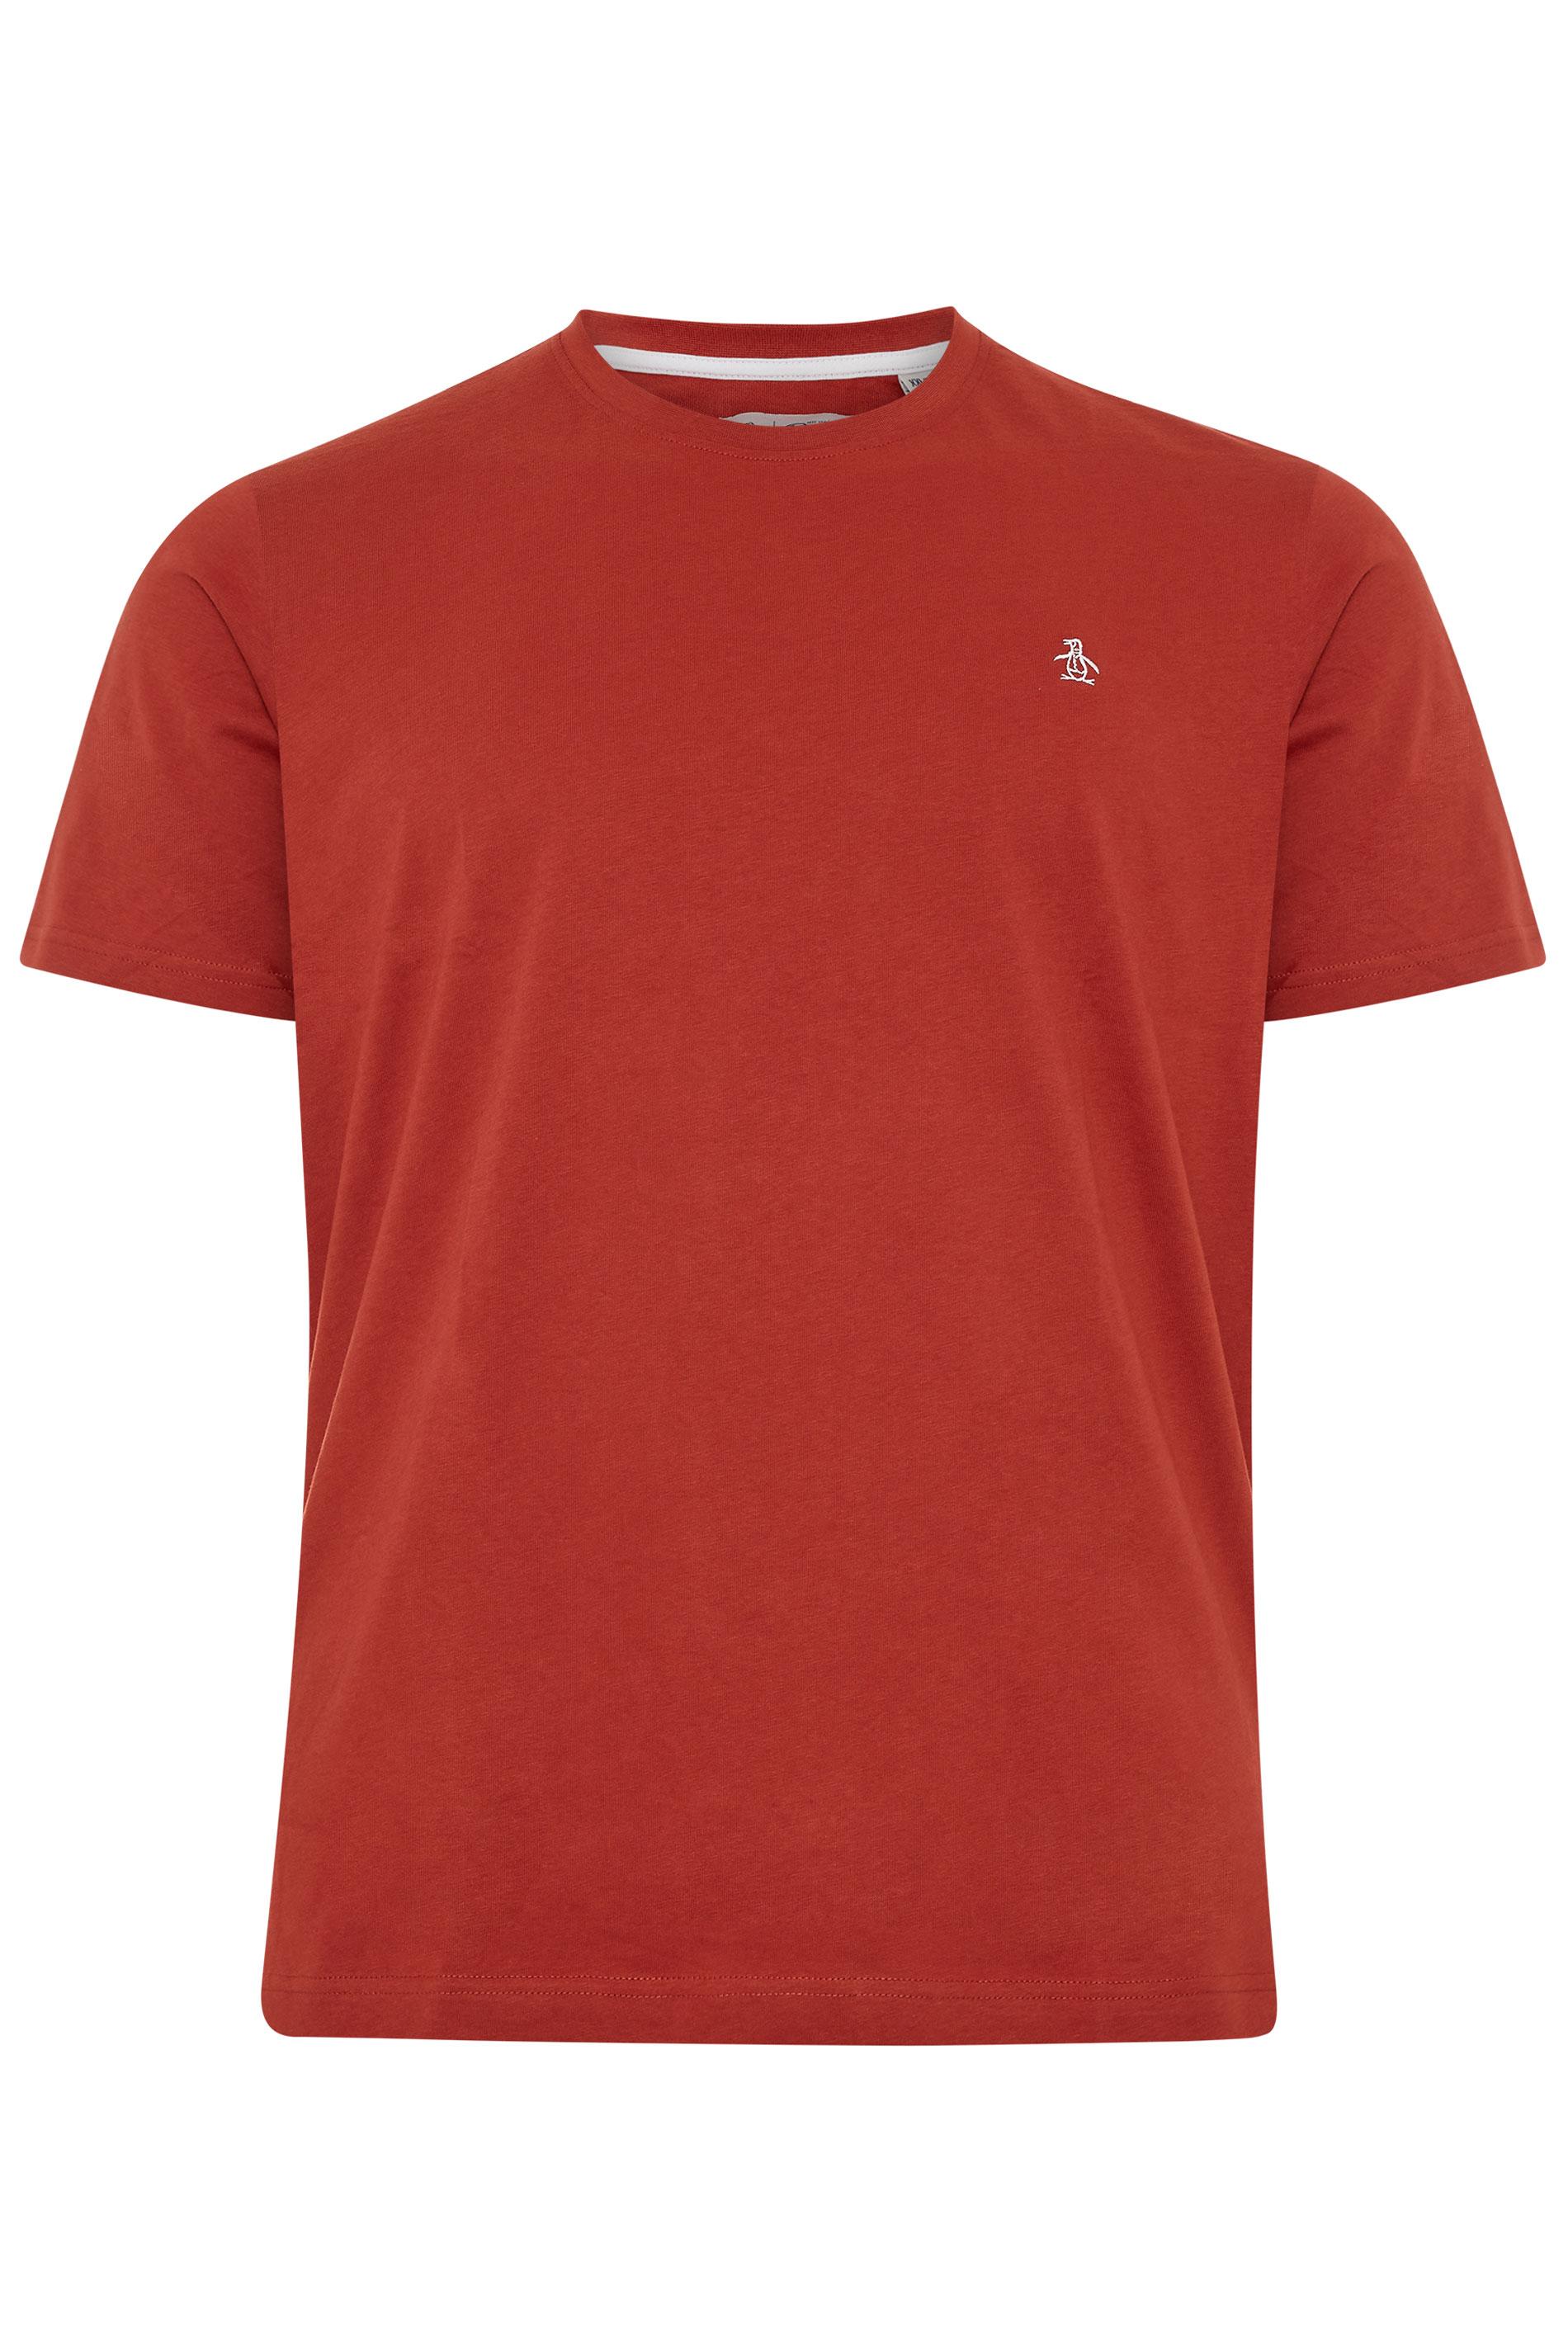 PENGUIN MUNSINGWEAR Red Crew Neck T-Shirt_F.jpg